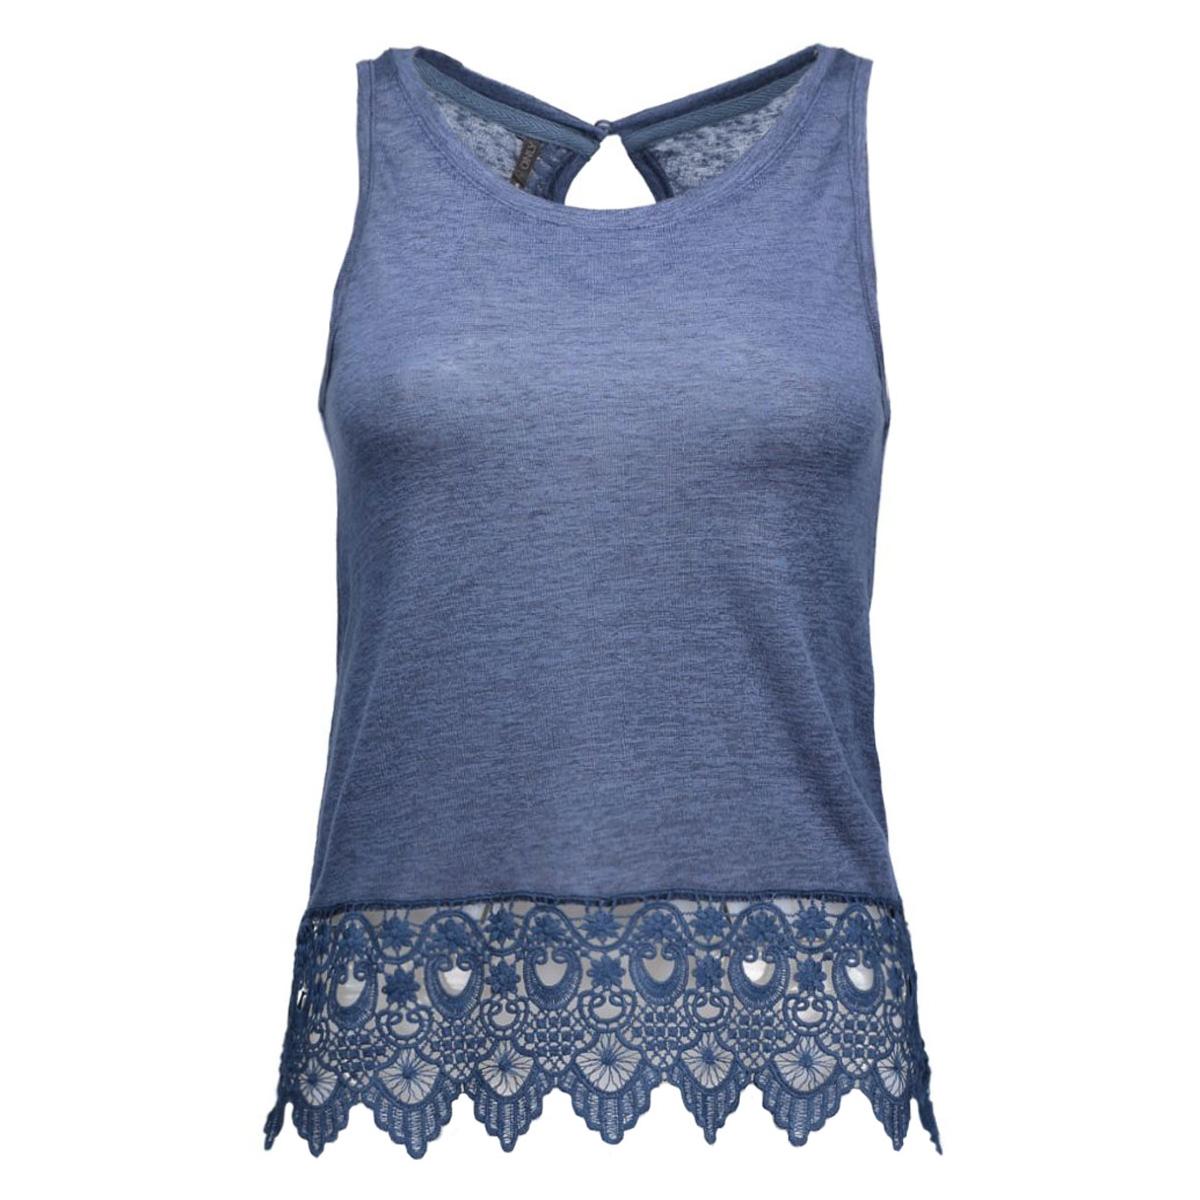 onlbonnie s/l crochet tank top ess 15118695 only top vintage indigo/tonal croc